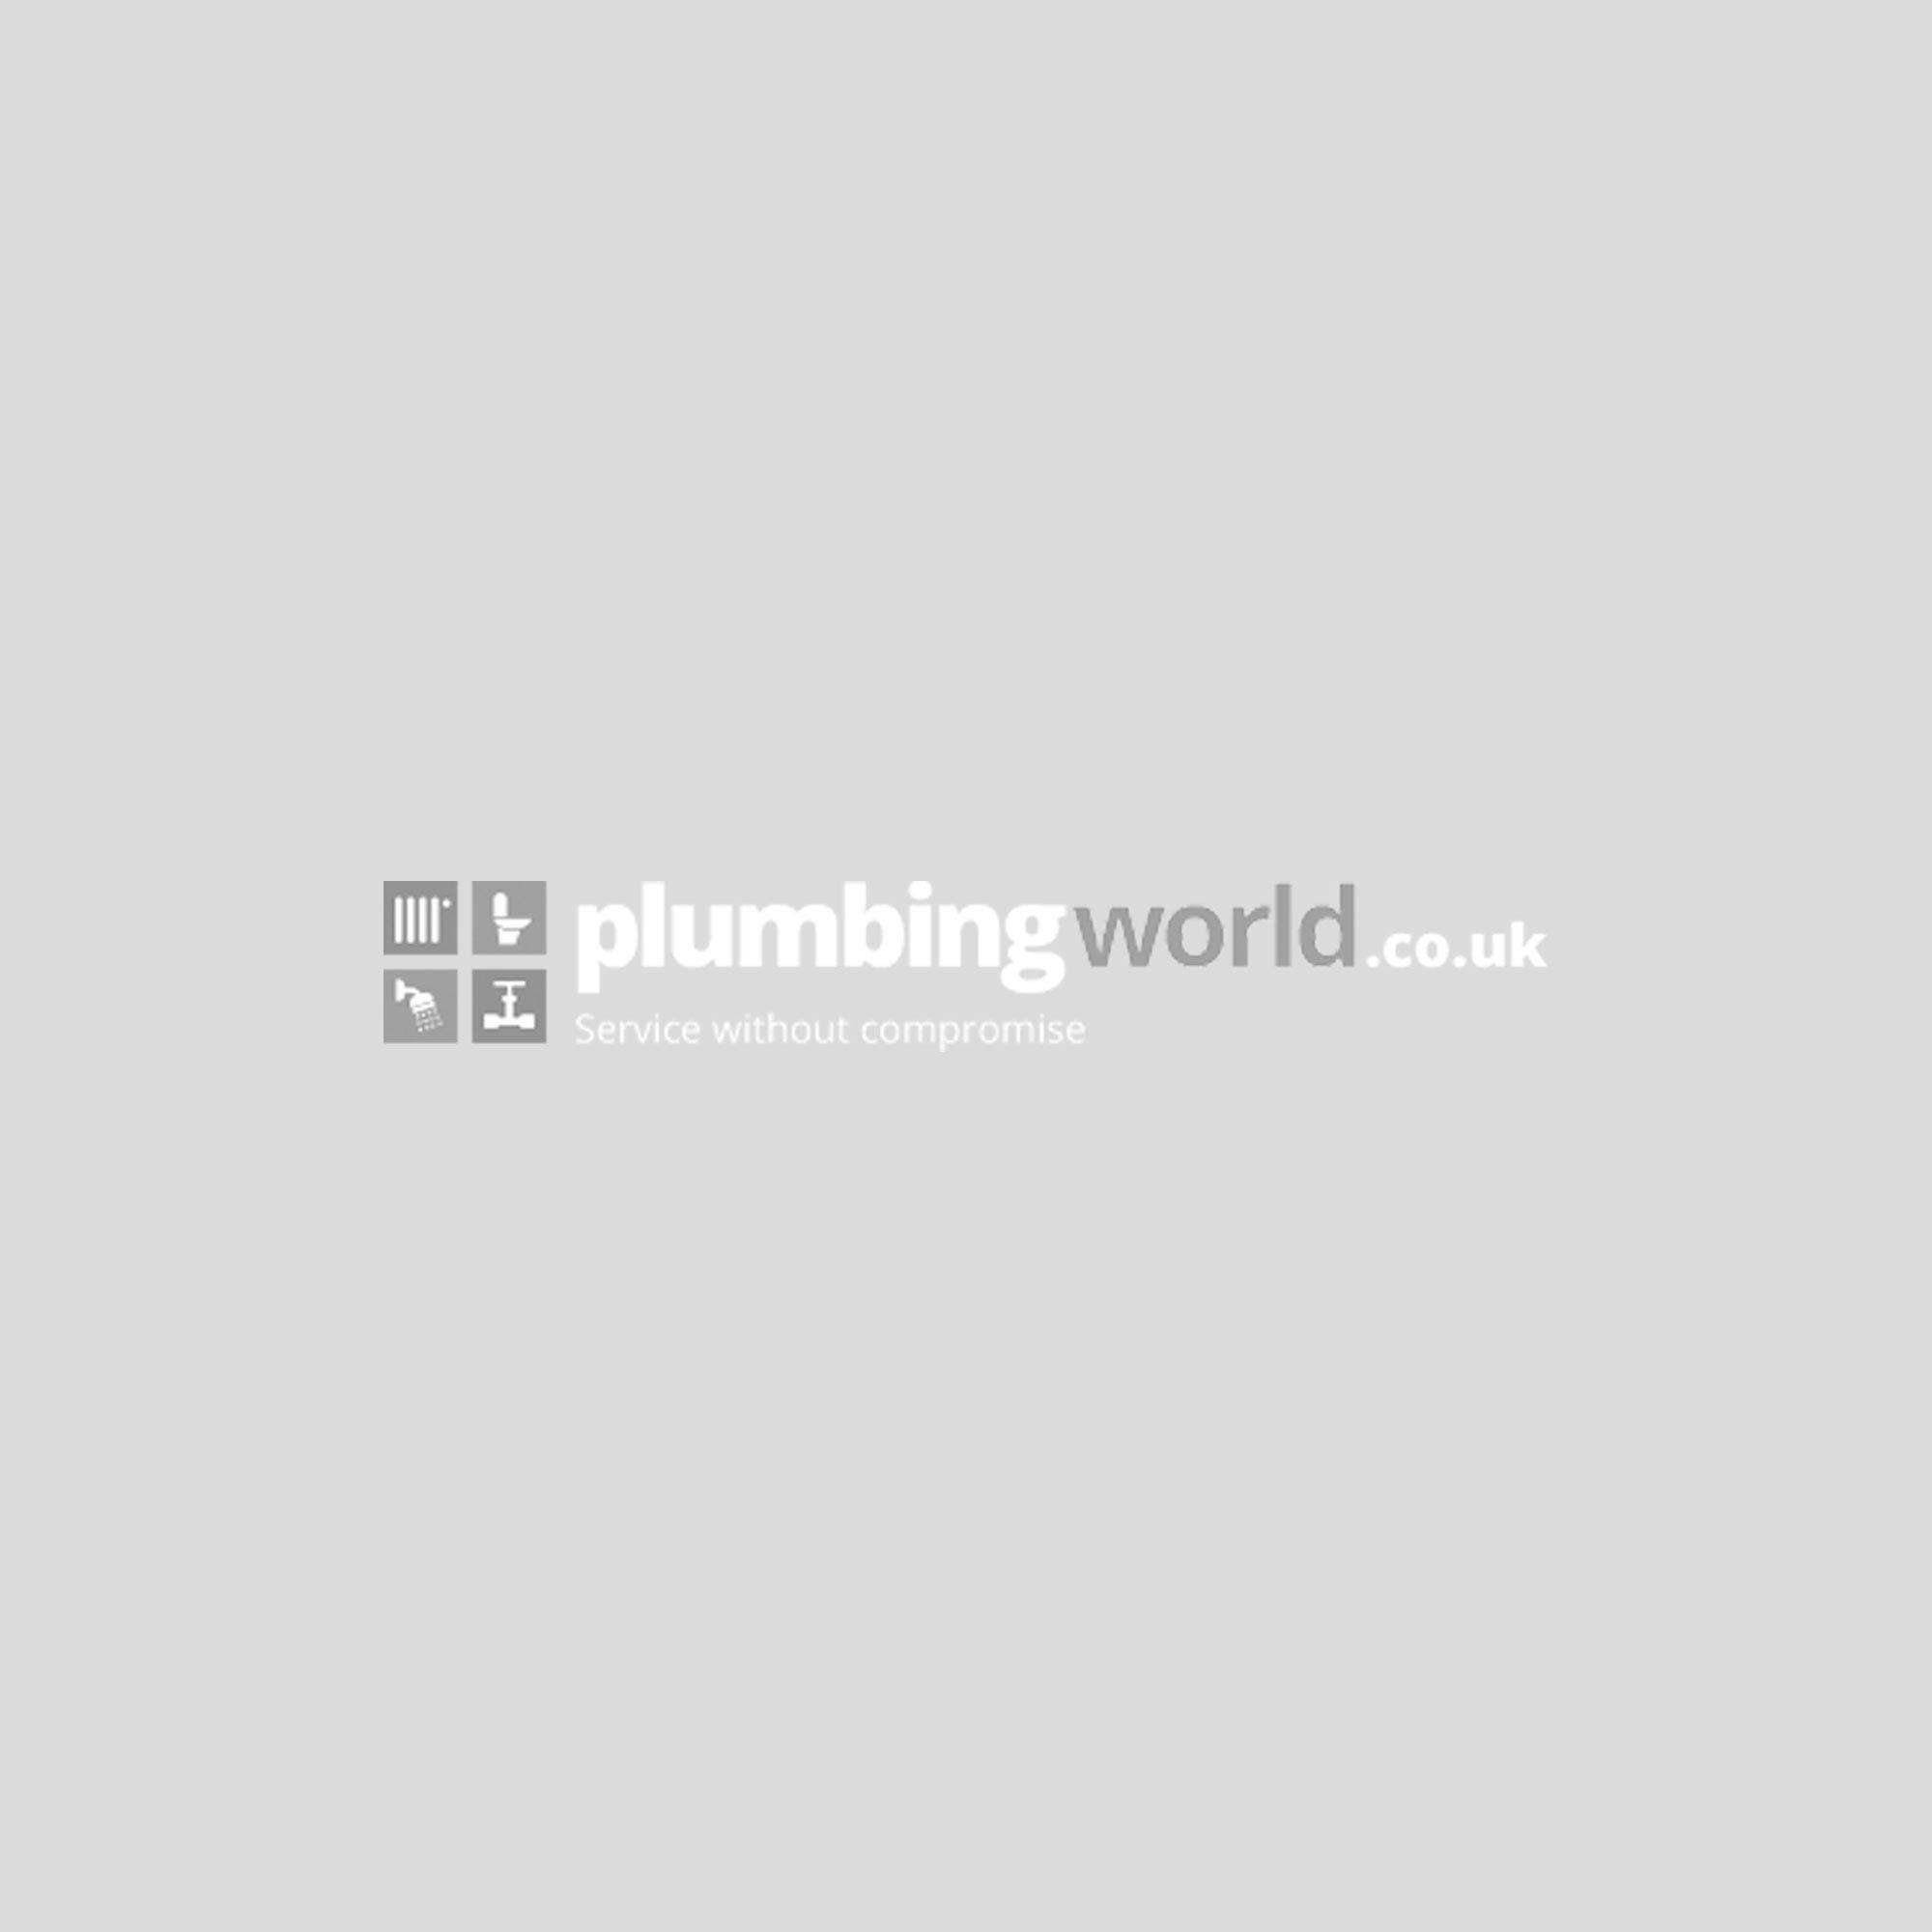 1200mm wide x 2400mm High x 10mm Depth PVC Shower Panel - Silver Travertine Stone